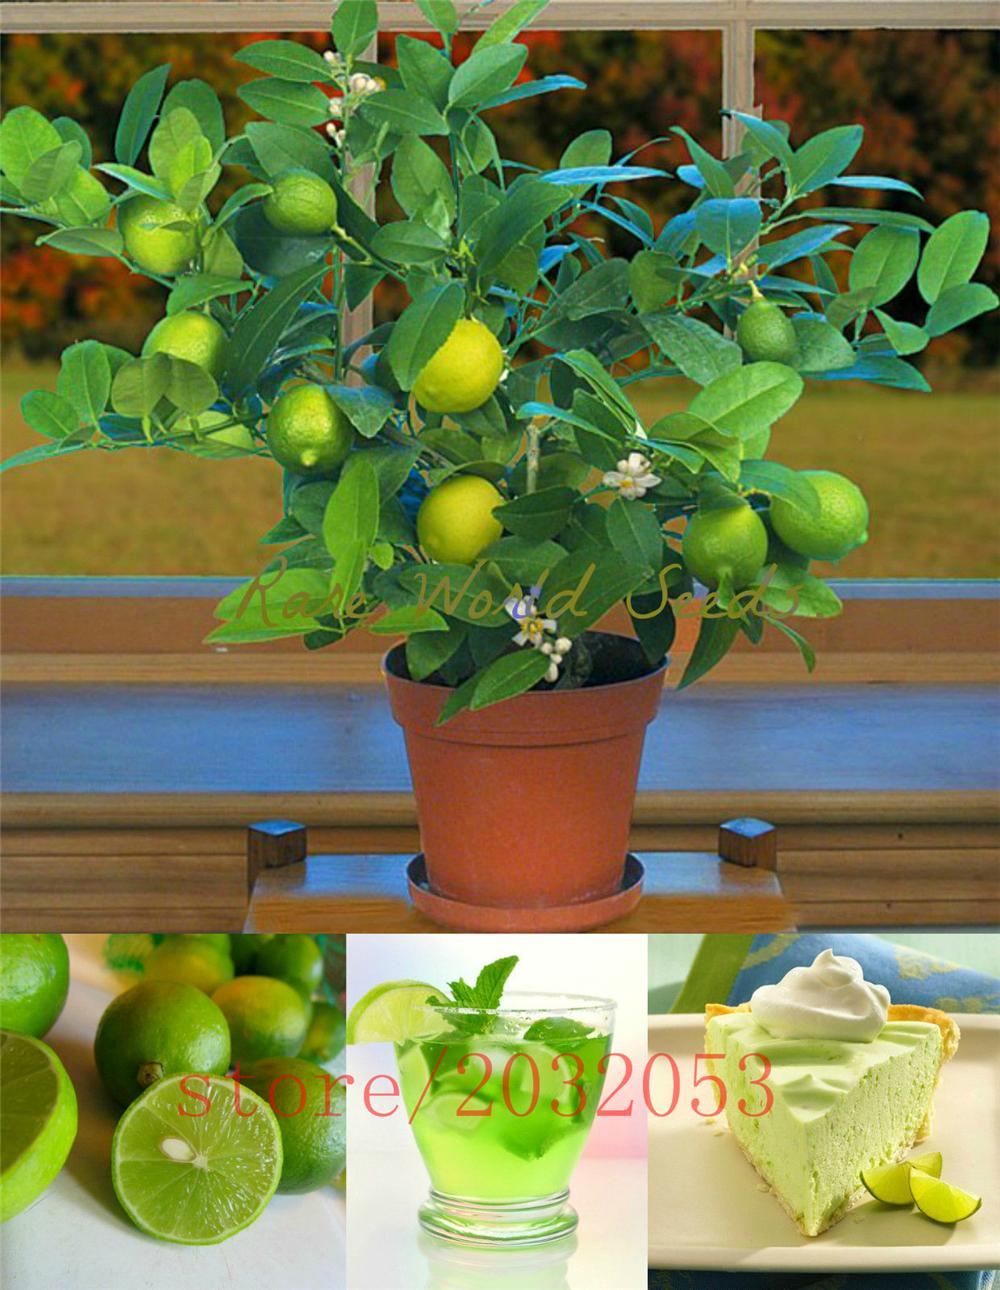 20pcs/bag kaffir lime seeds, lime seeds, (Citrus aurantifolia) ,organic fruit seeds, BONSAI fruit lemon tree for home garden(China (Mainland))